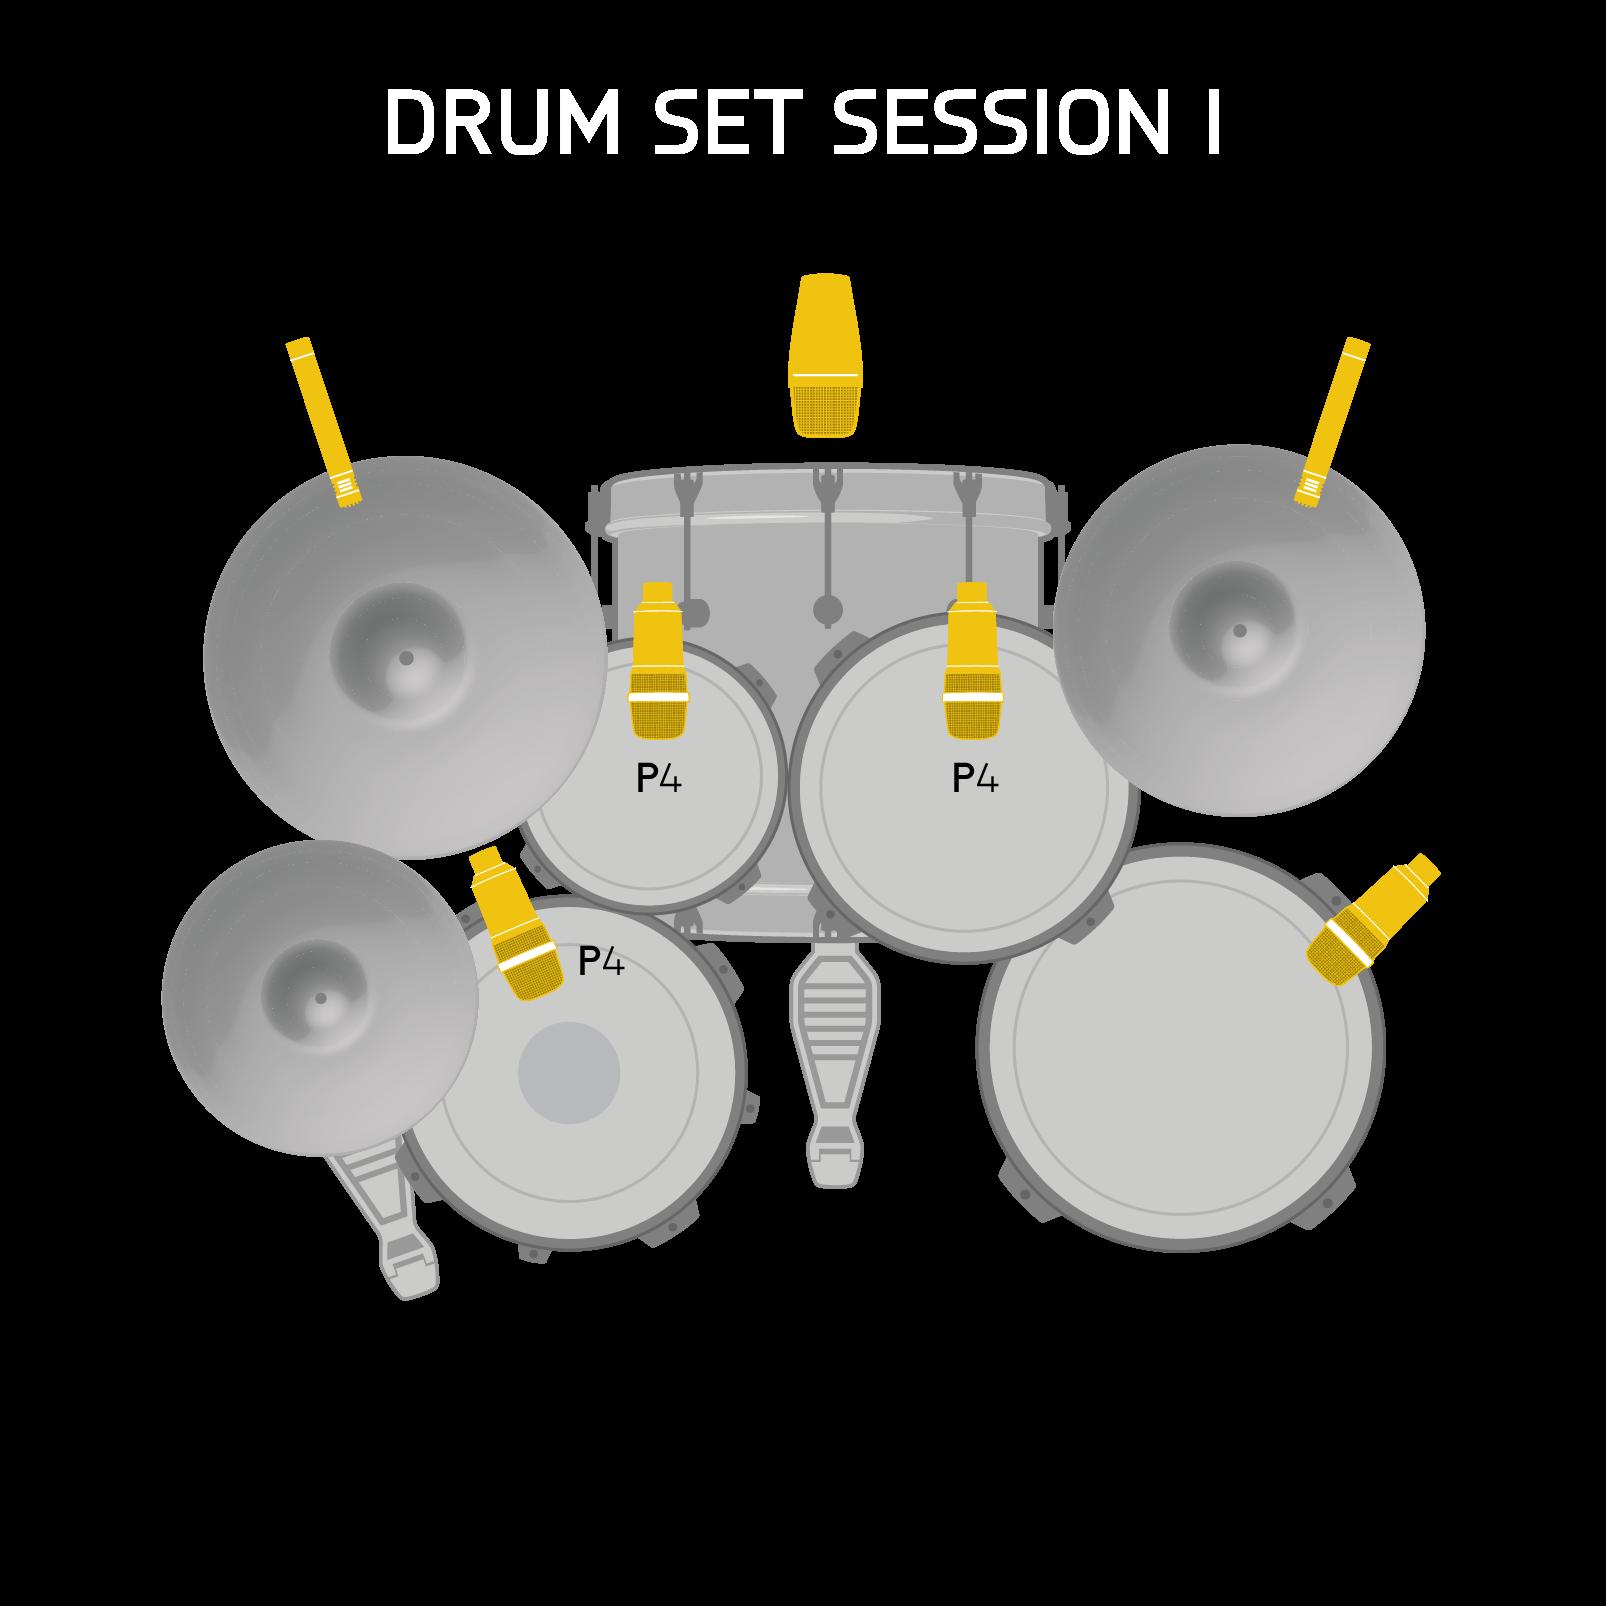 Drum Set Session I